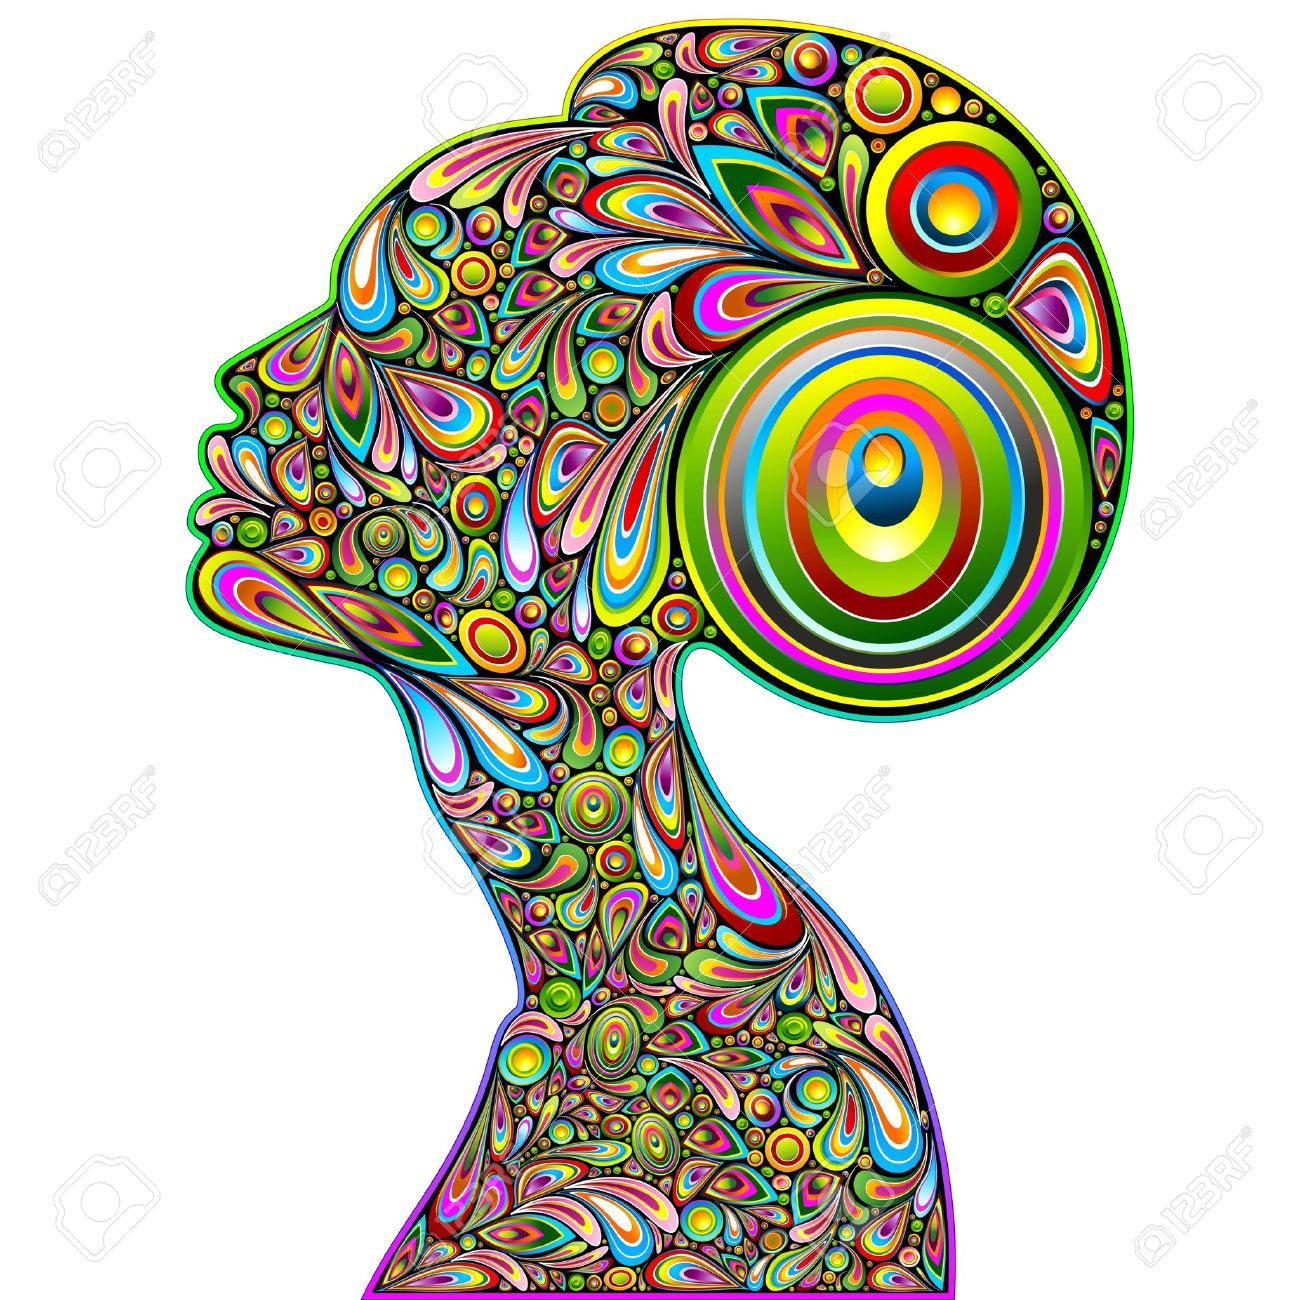 Art Design | Woman Psychedelic Portrait Art Design Royalty Free Cliparts Vectors